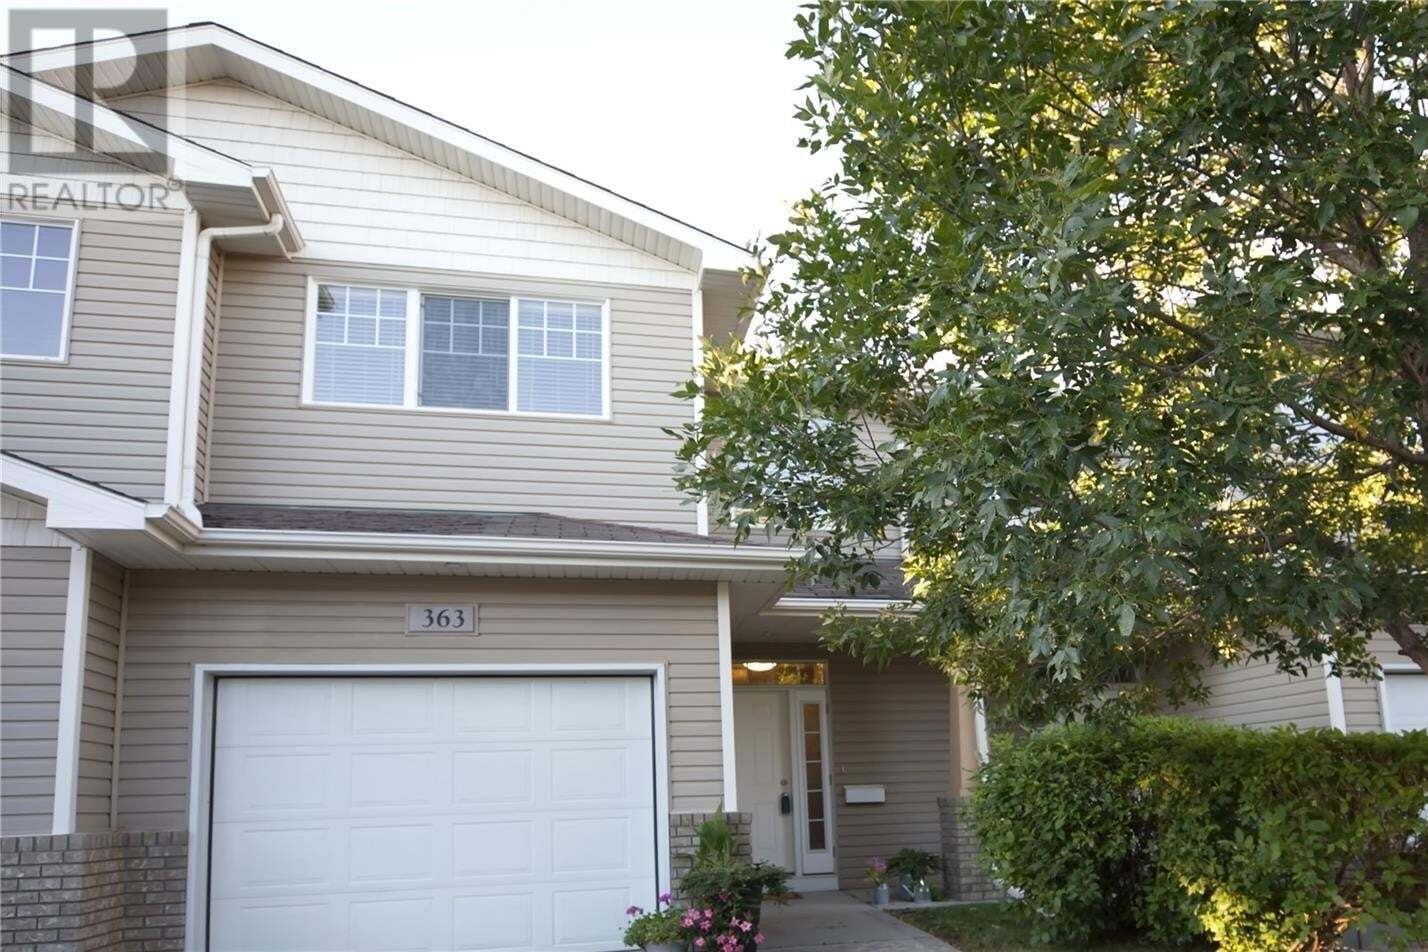 Townhouse for sale at 363 Pickard Wy N Regina Saskatchewan - MLS: SK825947